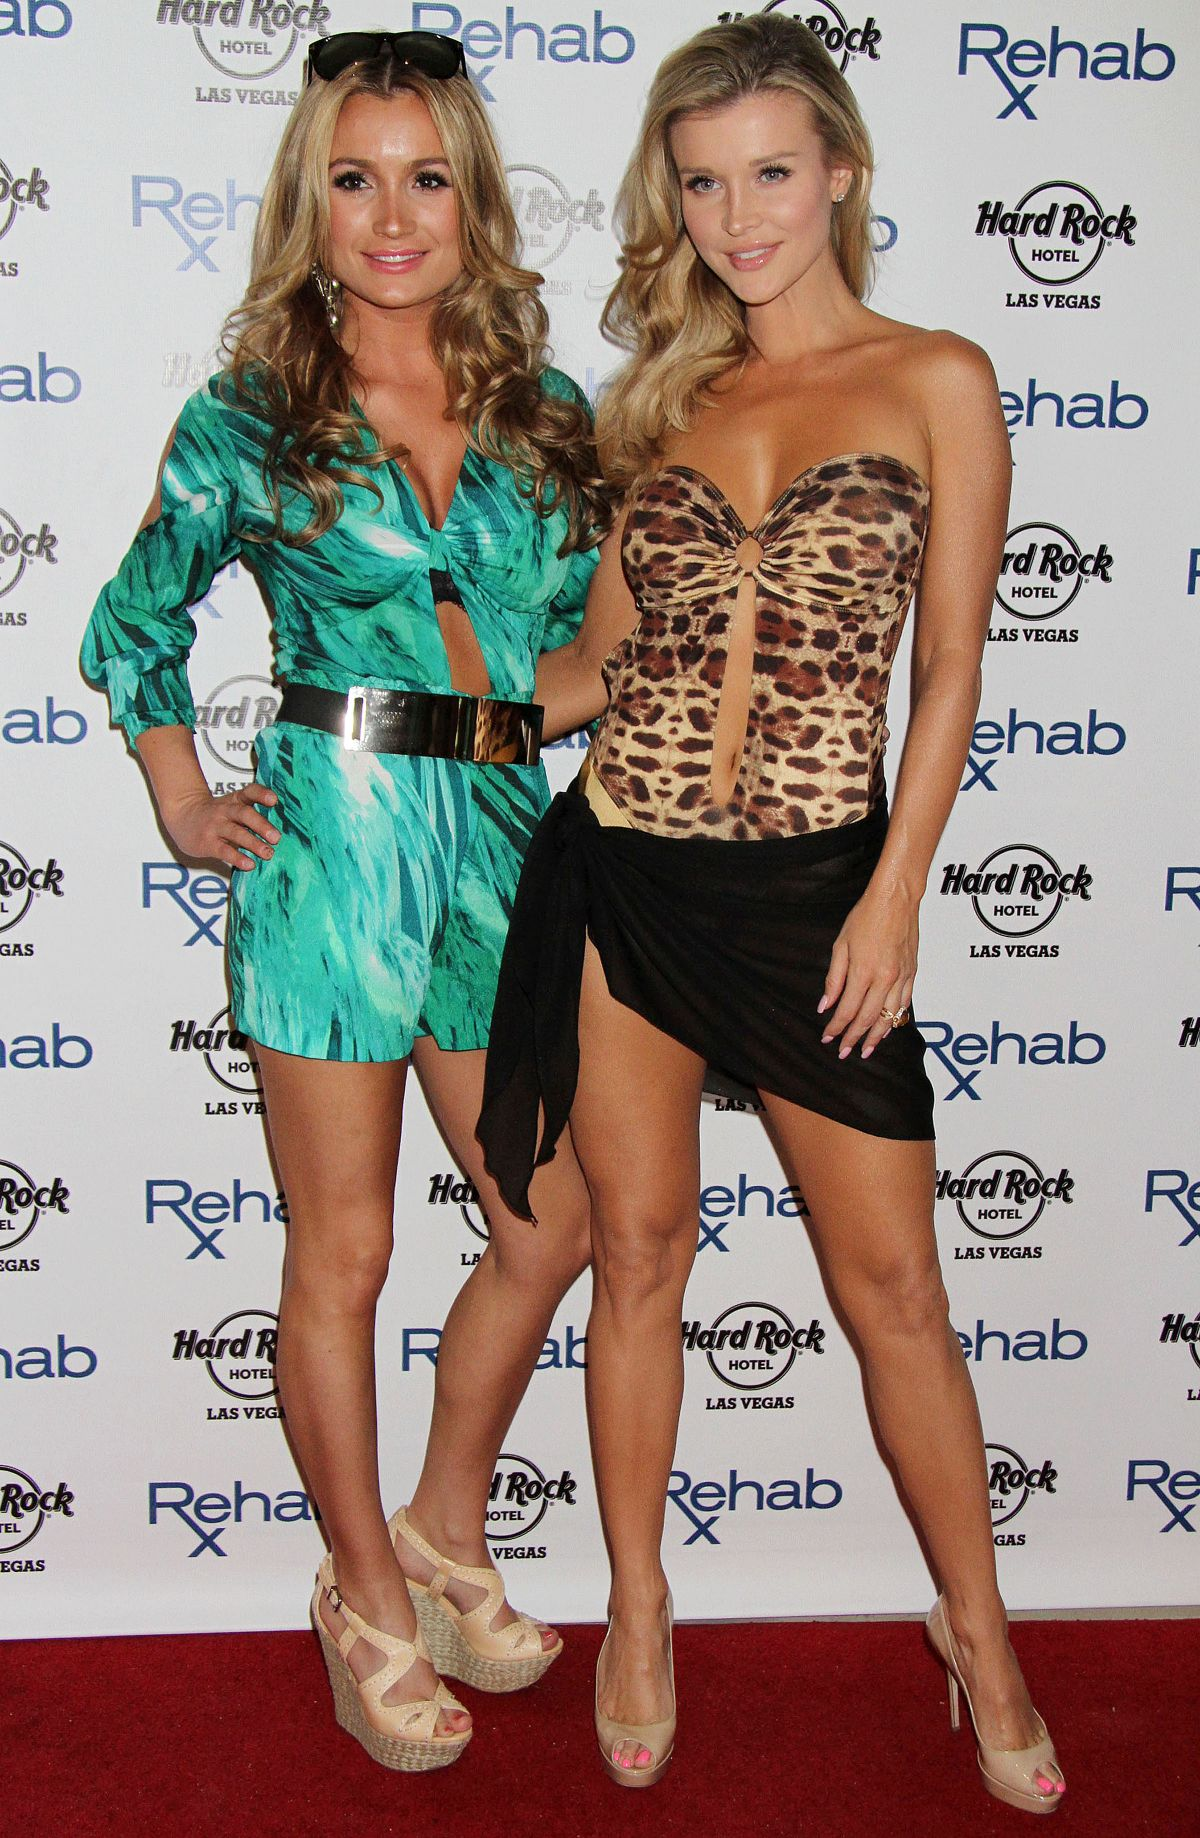 JOANNA and MARTA KRUPA at Rehab Bikini Invitational Round 1